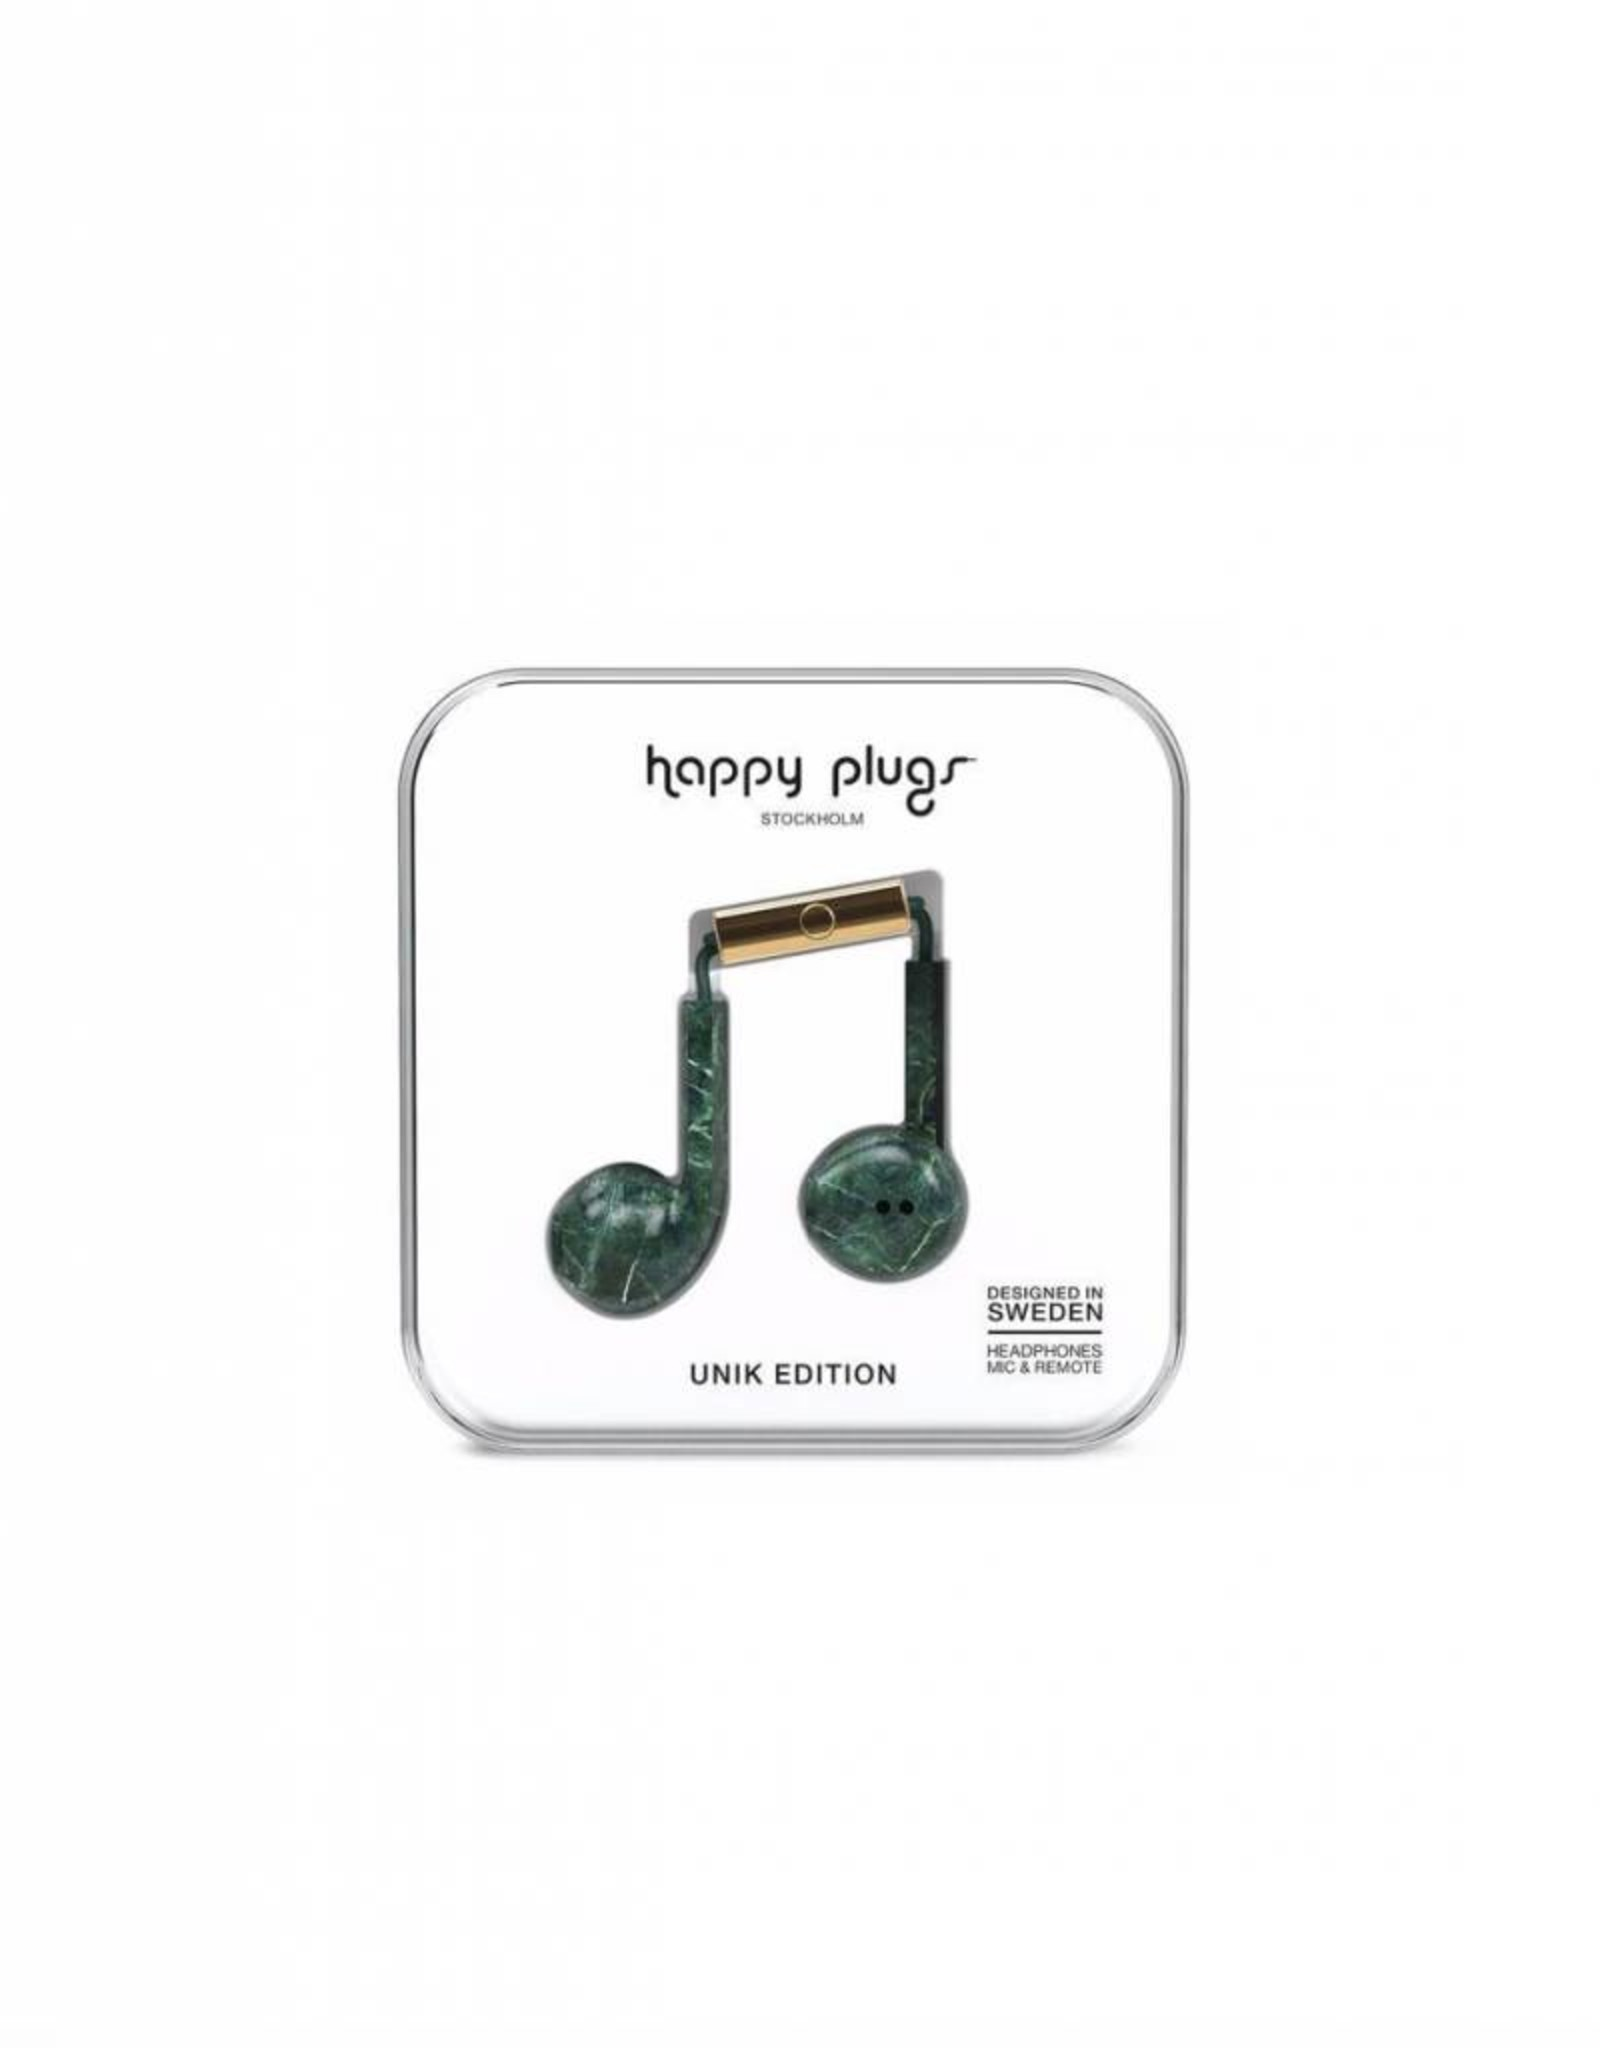 HAPPY PLUGS HAPPY PLUGS EARPOD HEADPHONES WITH REMOTE AND MIC